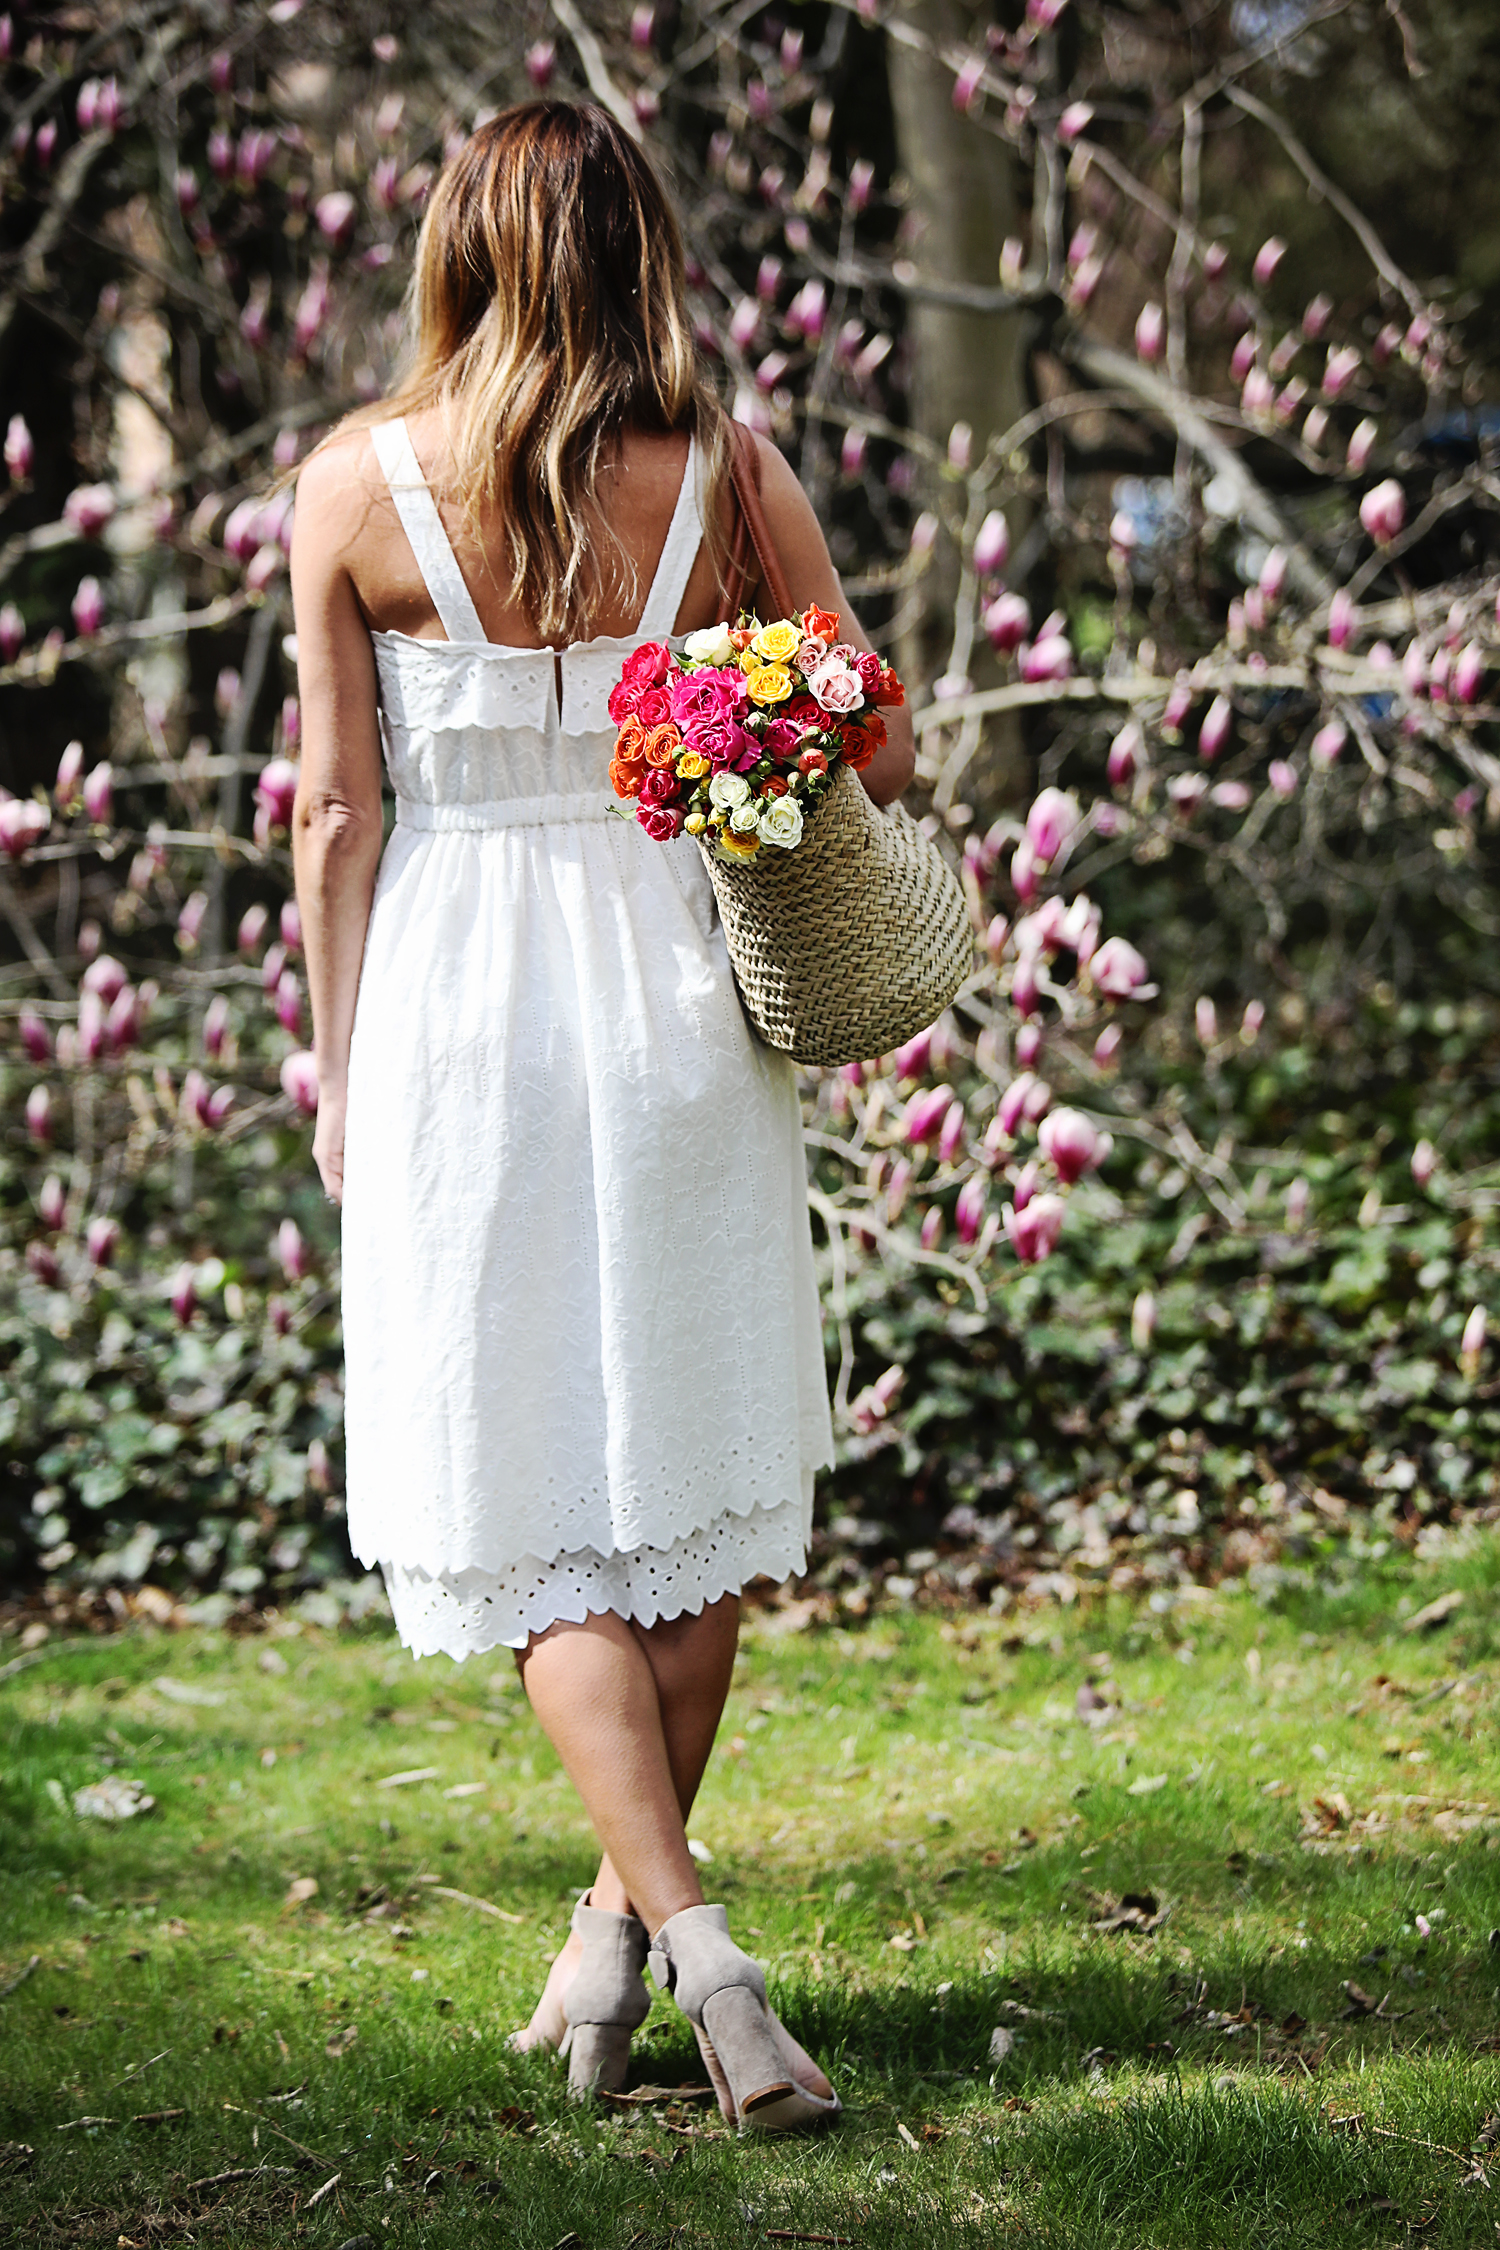 The Motherchic wearing white dress